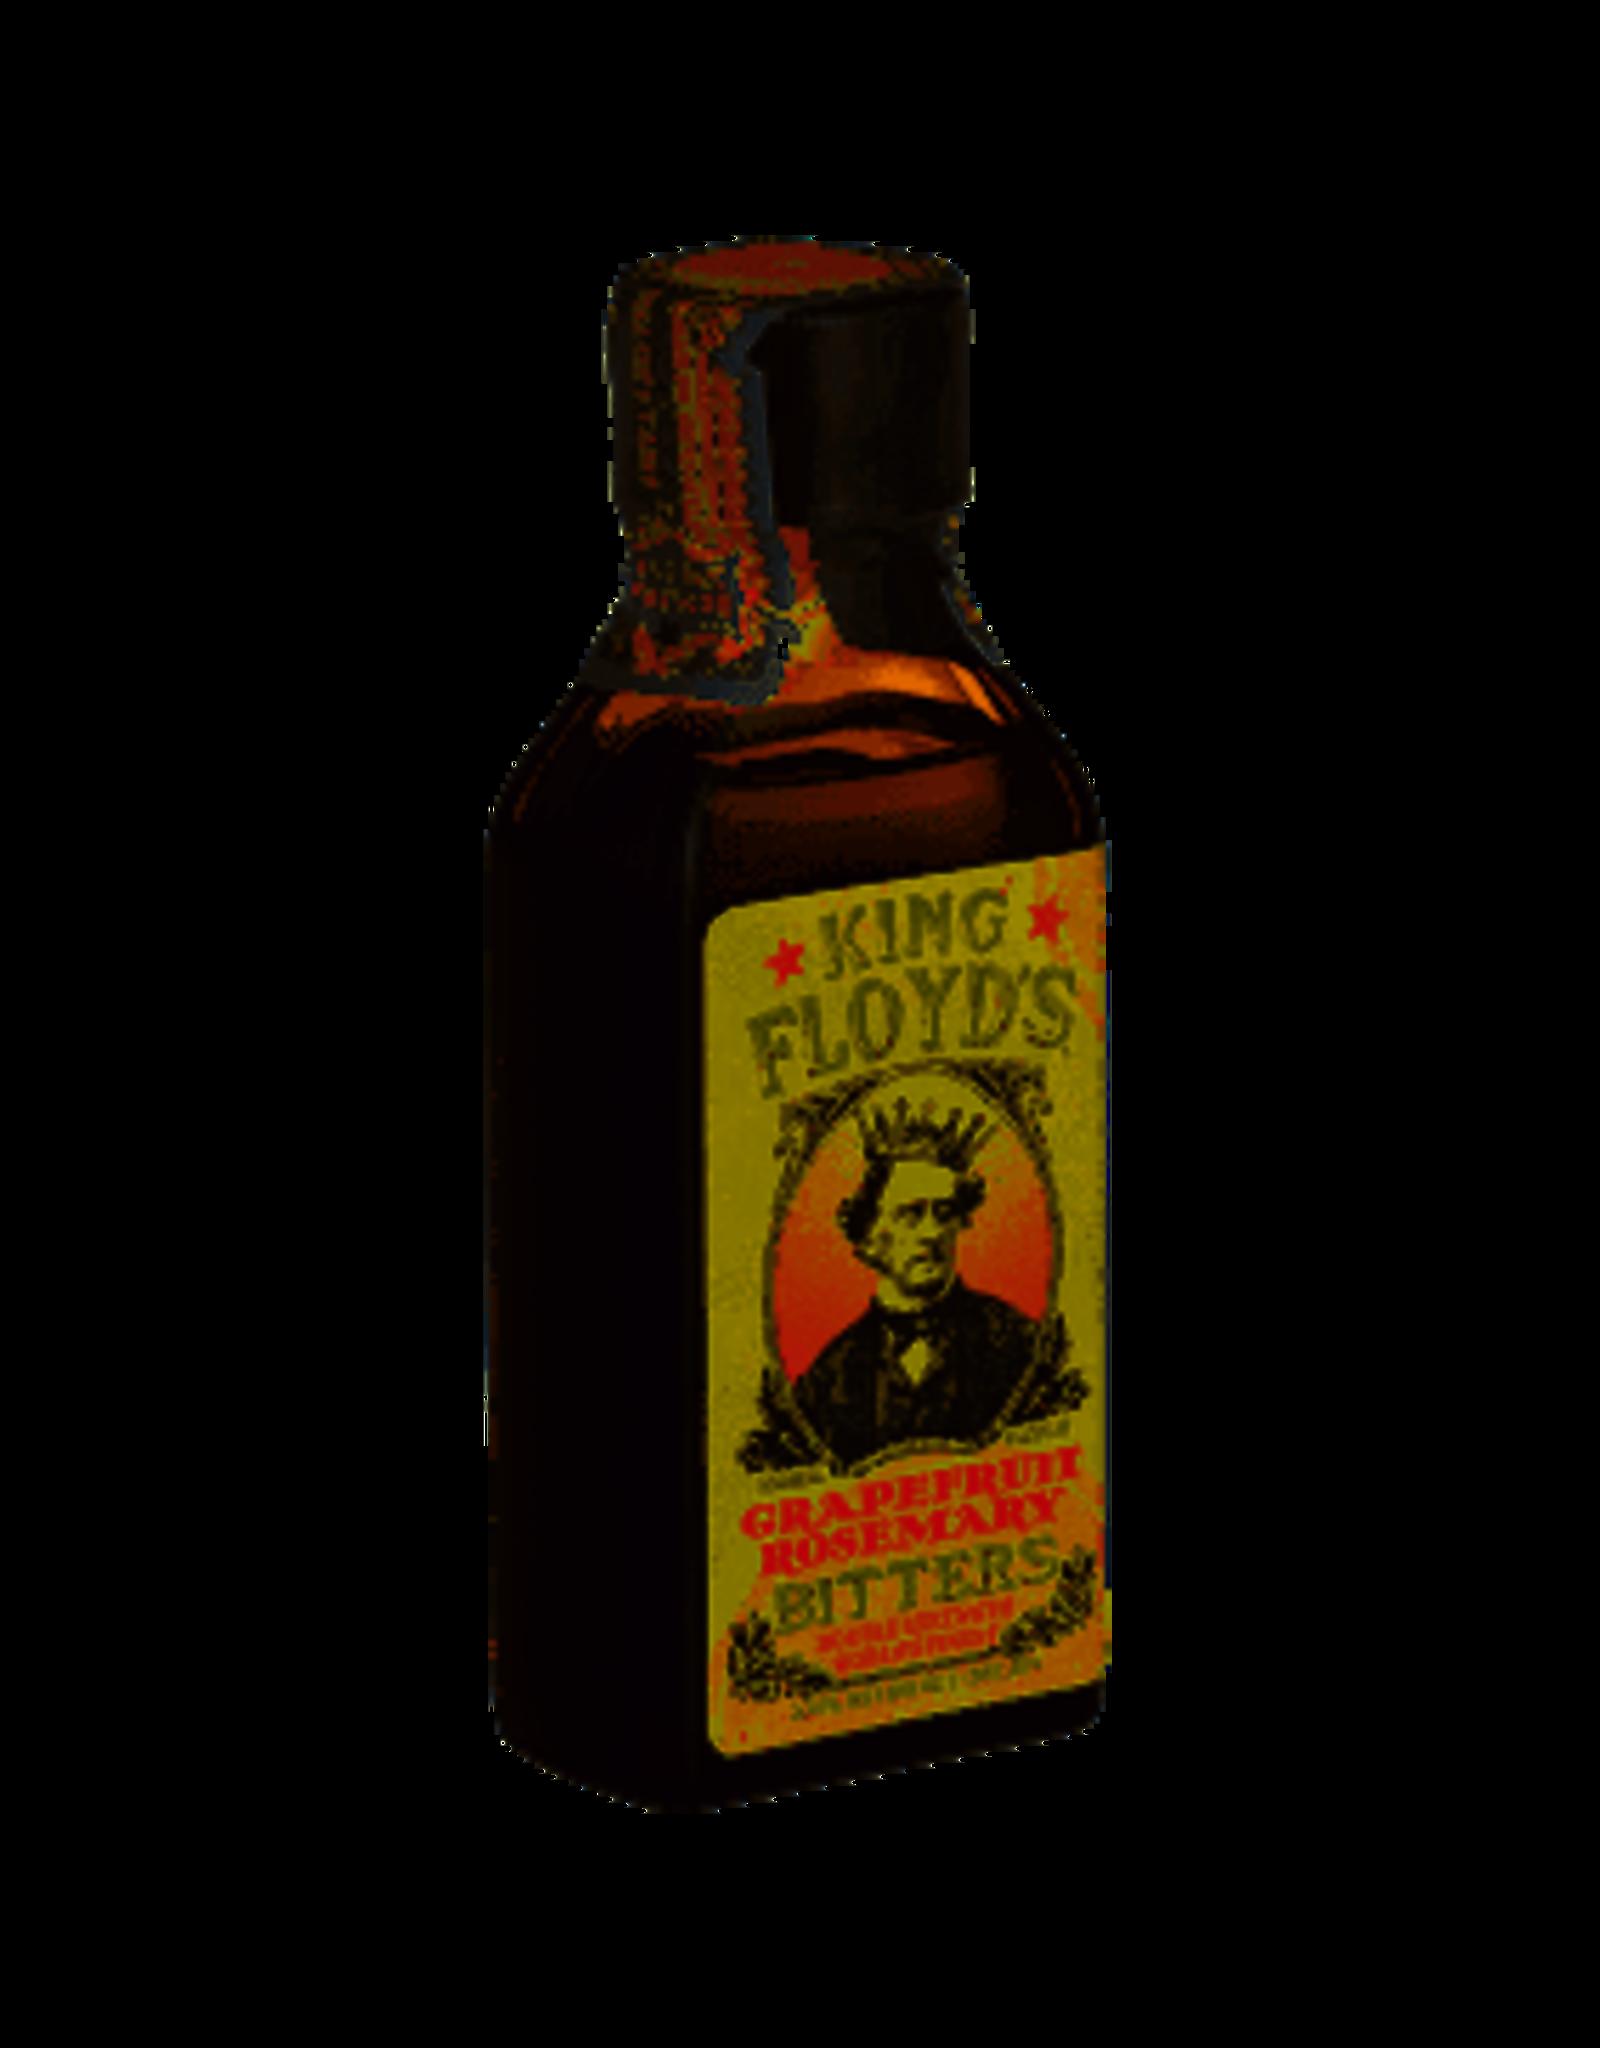 King Floyds, Grapefruit Rosemary